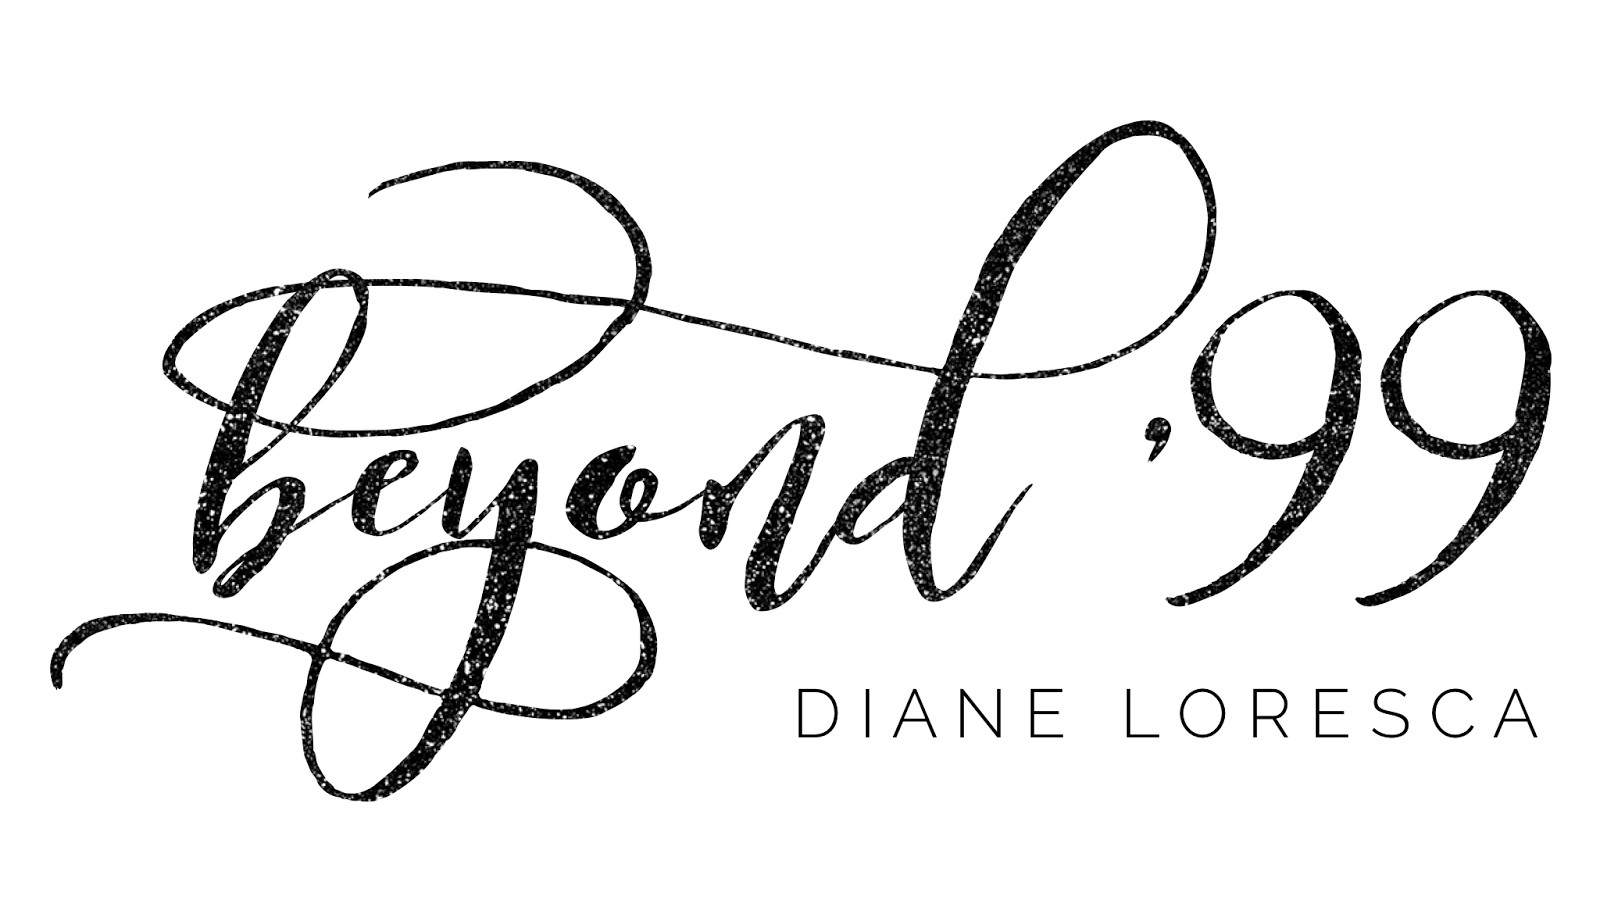 Experiences Beyond 1999 - Diane Loresca